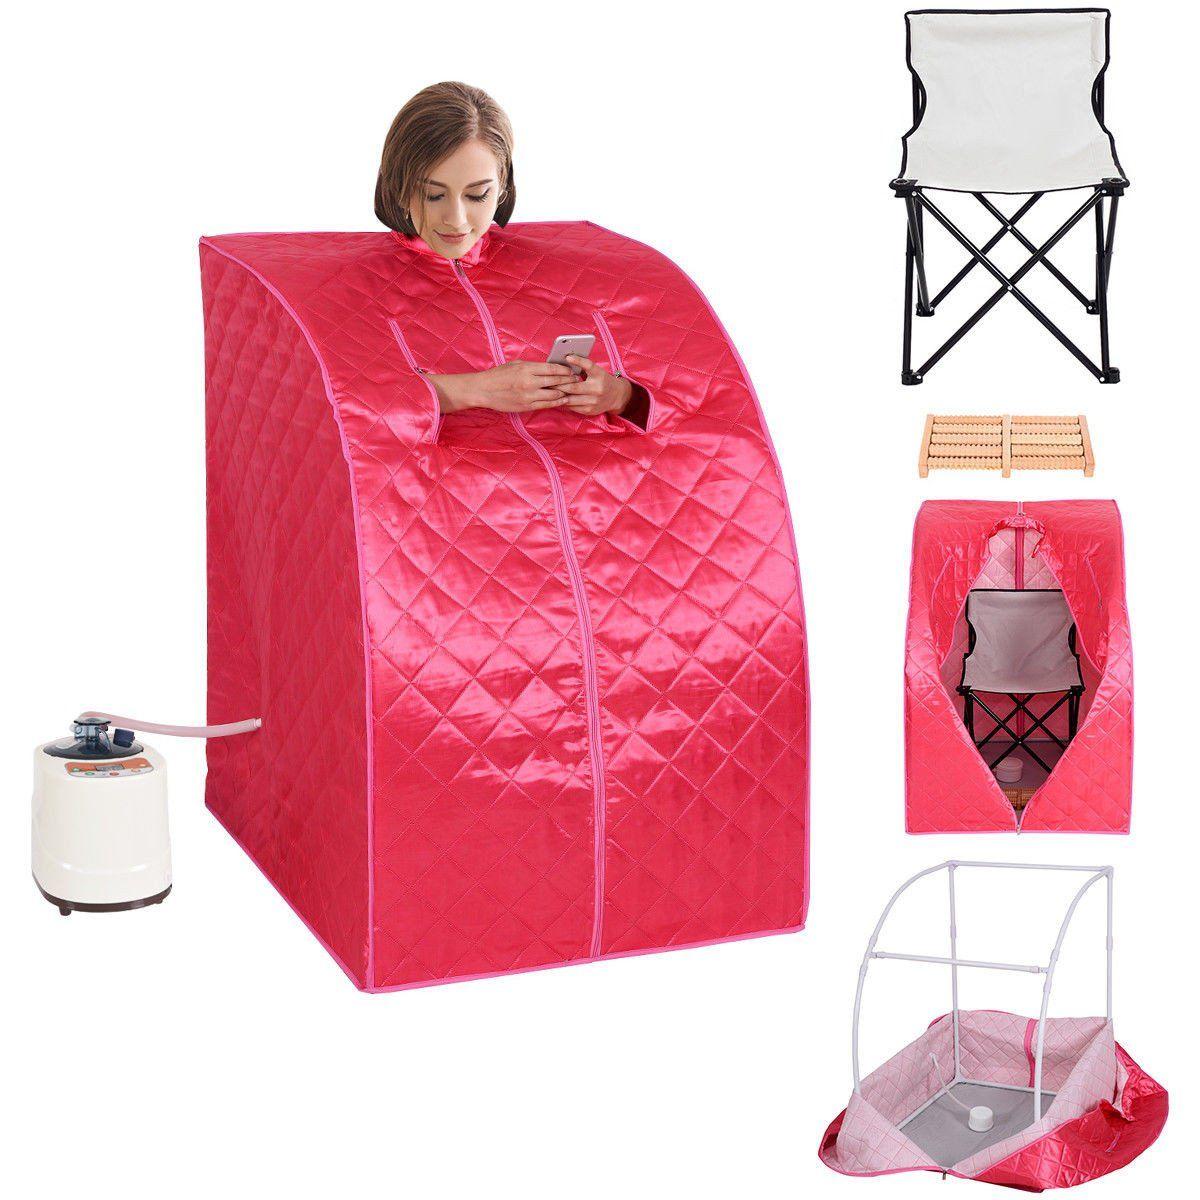 Costway Portable 2l Steam Sauna Spa Full Body Slimming